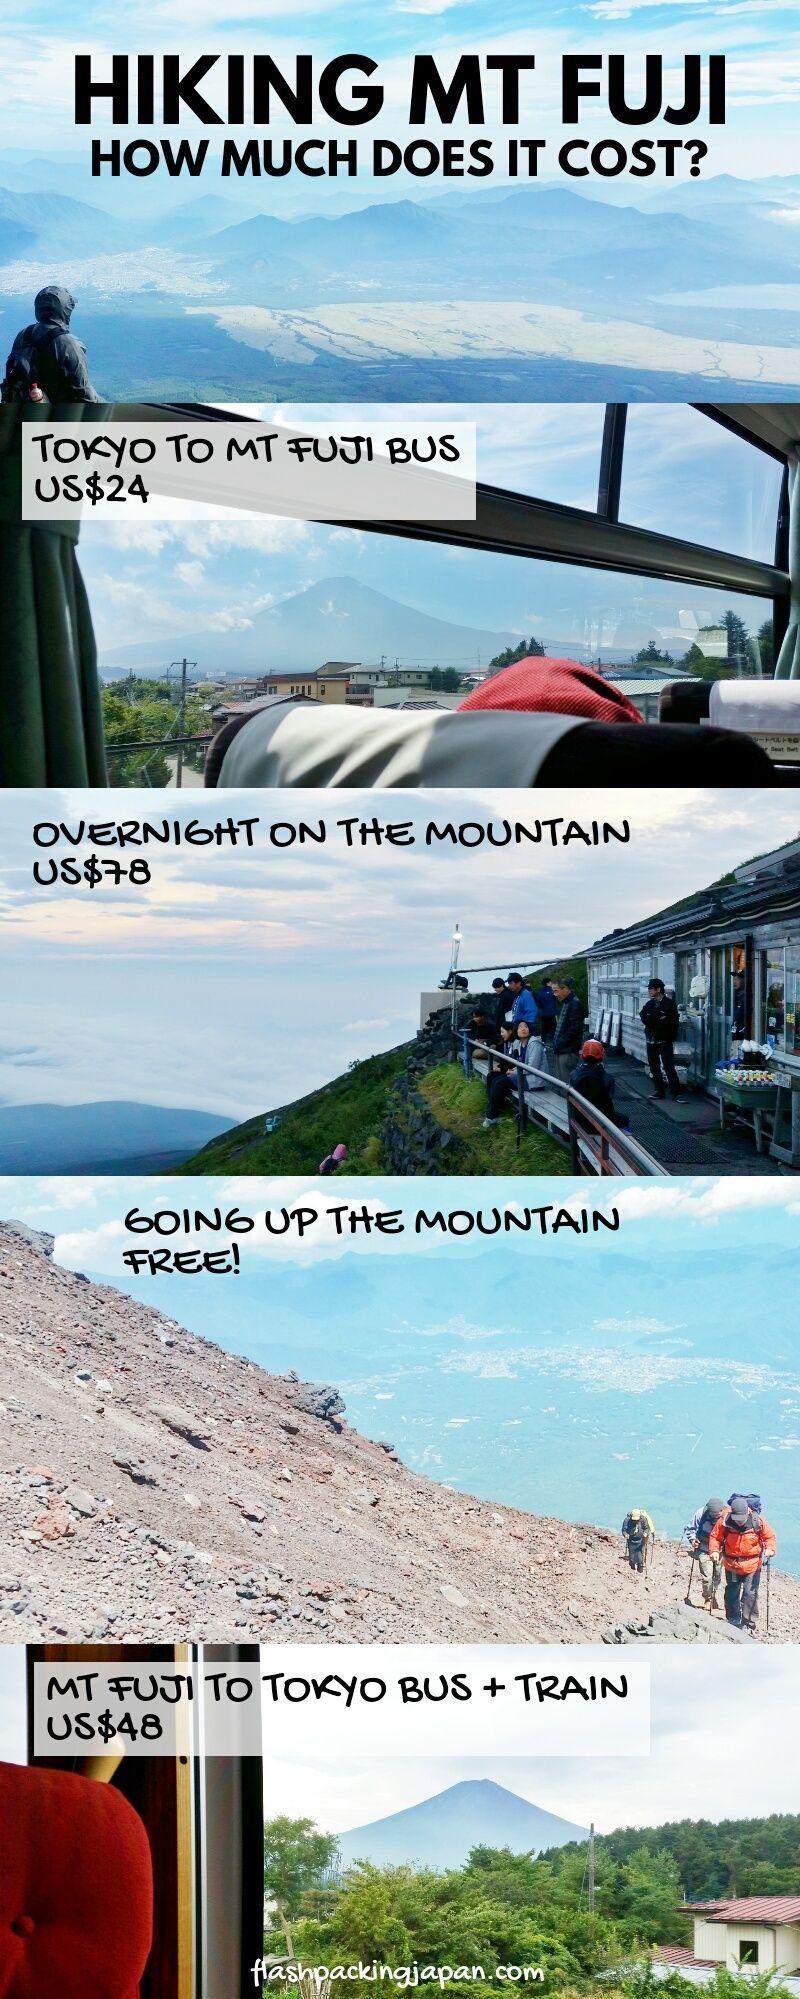 Climbing Mt Fuji Alone Cost From Tokyo Mountain Hut Stay Photos Hiking In Japan Flashpacking Japan Japan Travel Destinations Travel Japan Cheap Japan Travel